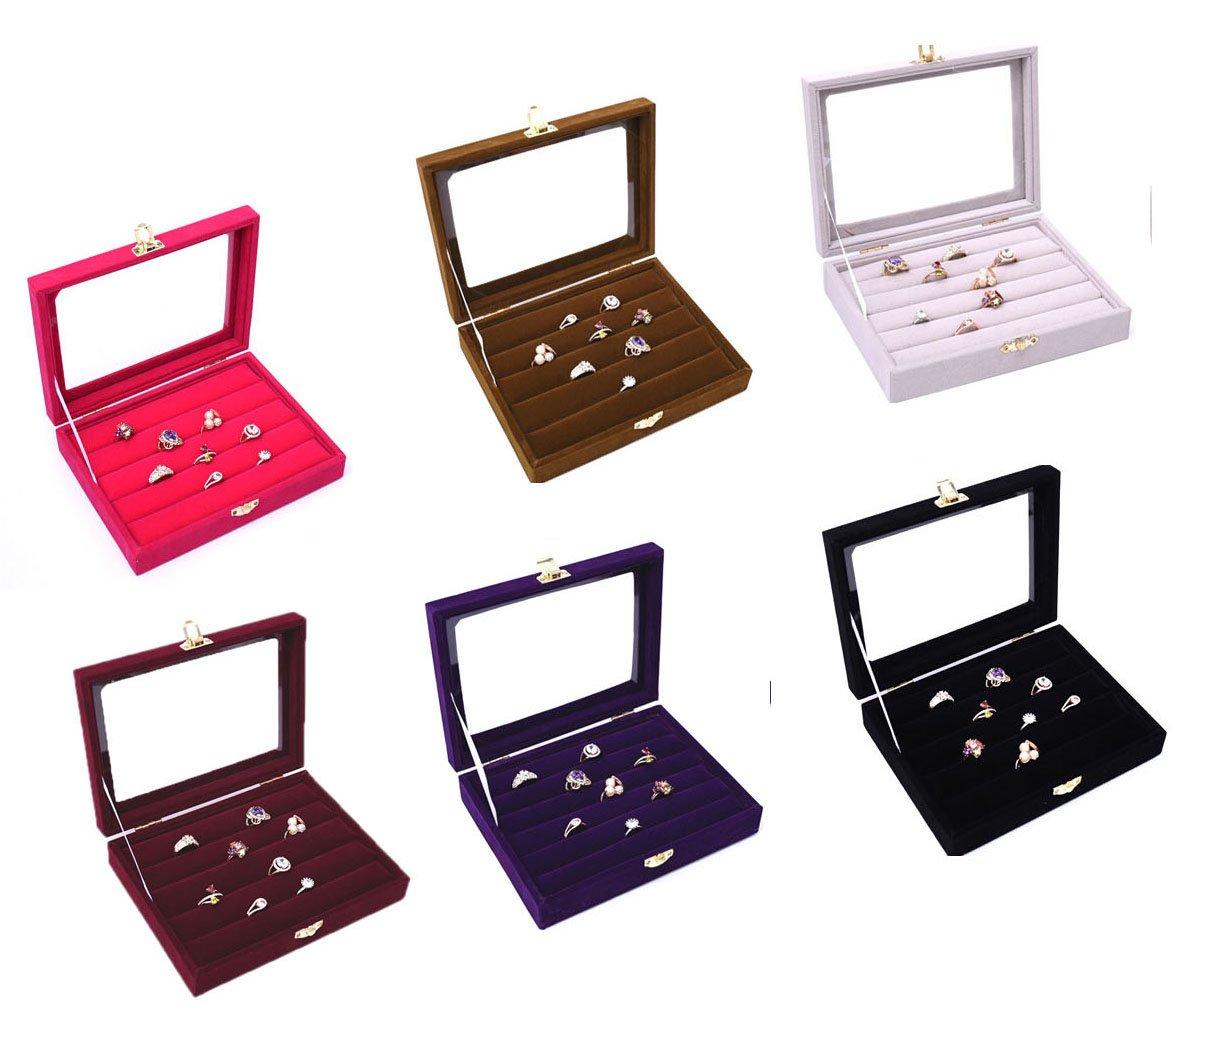 Top grade velvet jewelry display ring trays earring for Velvet jewelry organizer trays